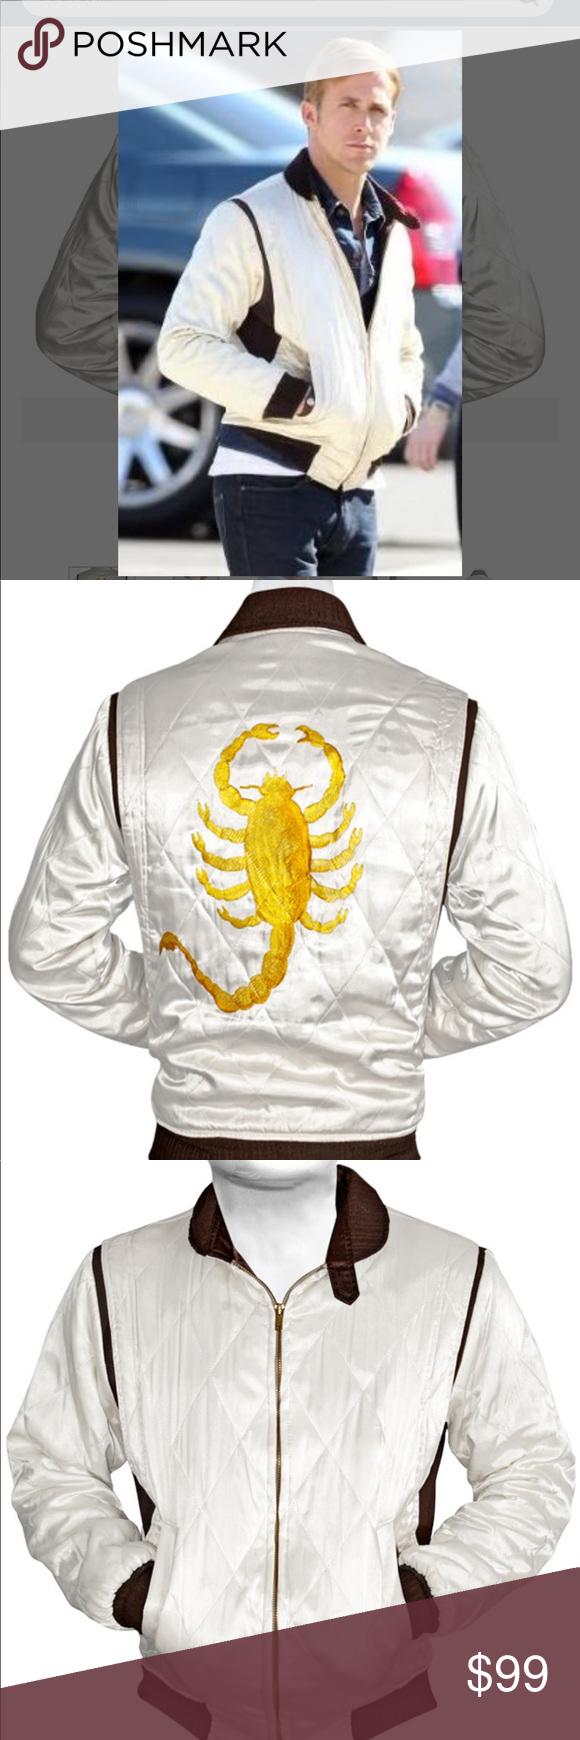 Ryan Gosling White Drive Scorpio Jacket New Xs Jackets Clothes Design Ryan Gosling [ 1740 x 580 Pixel ]